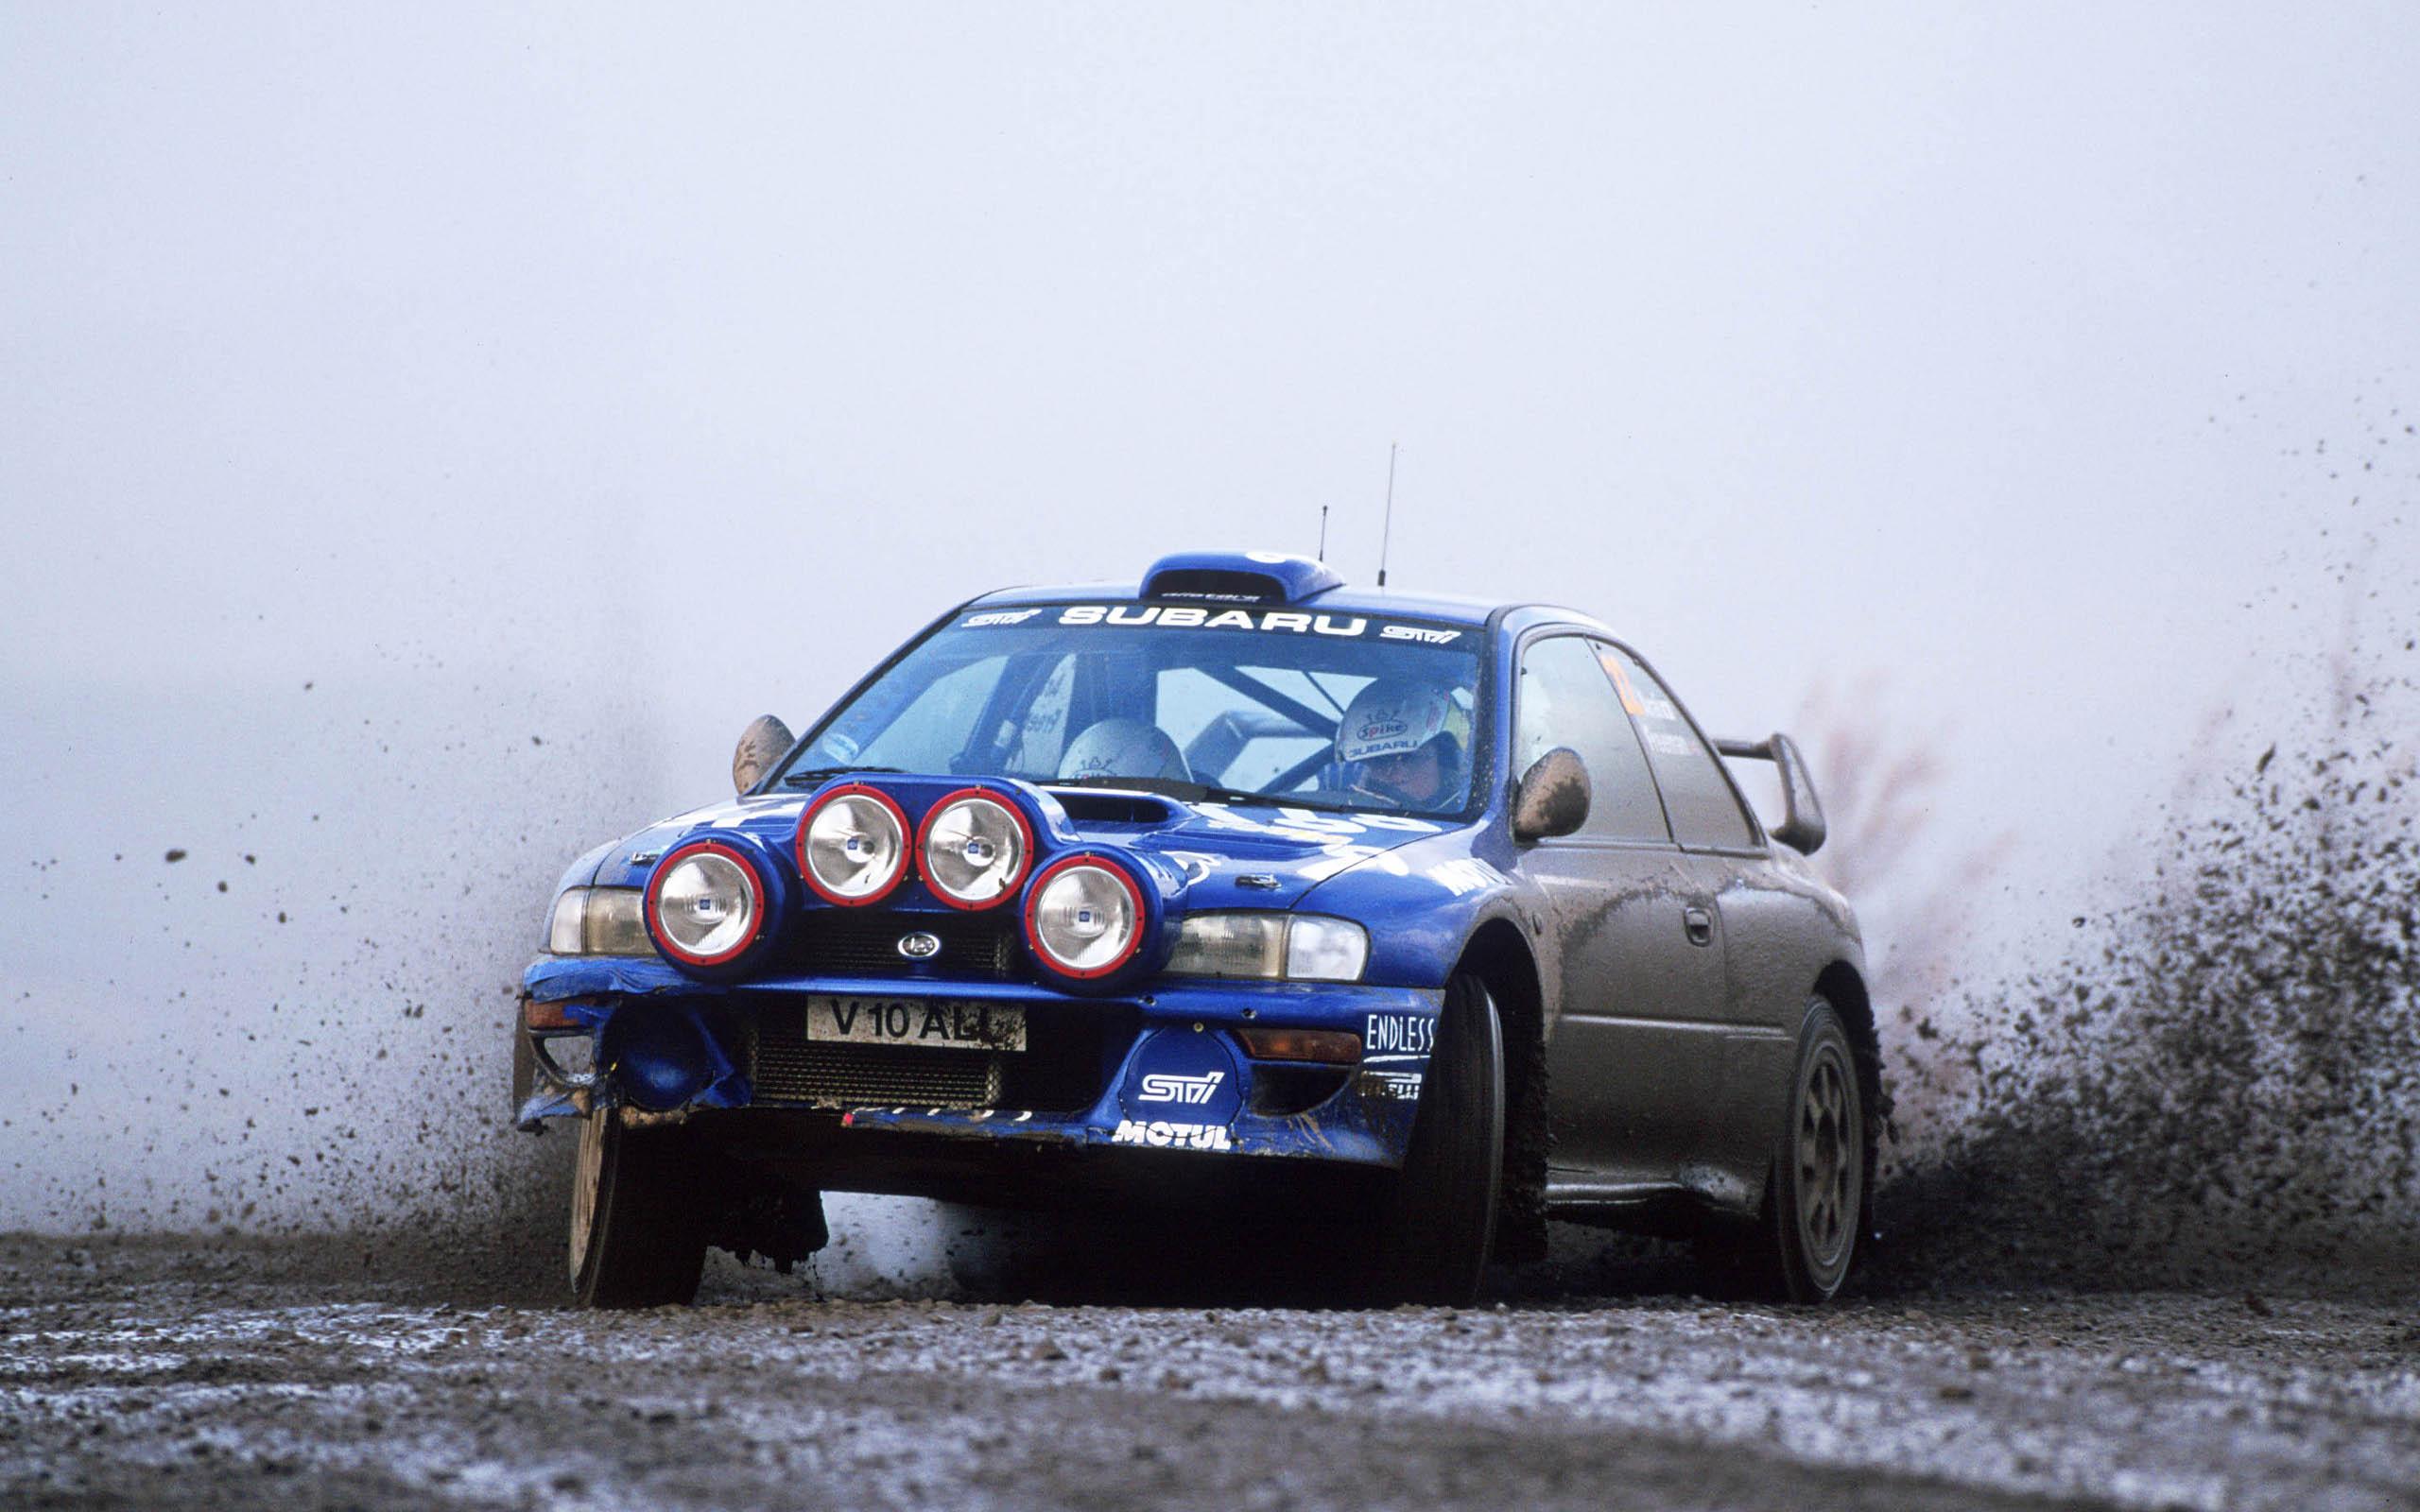 Cars subaru impreza wrx sti rally car wallpaper 2560x1600 cars subaru impreza wrx sti rally car wallpaper 2560x1600 60593 wallpaperup vanachro Images